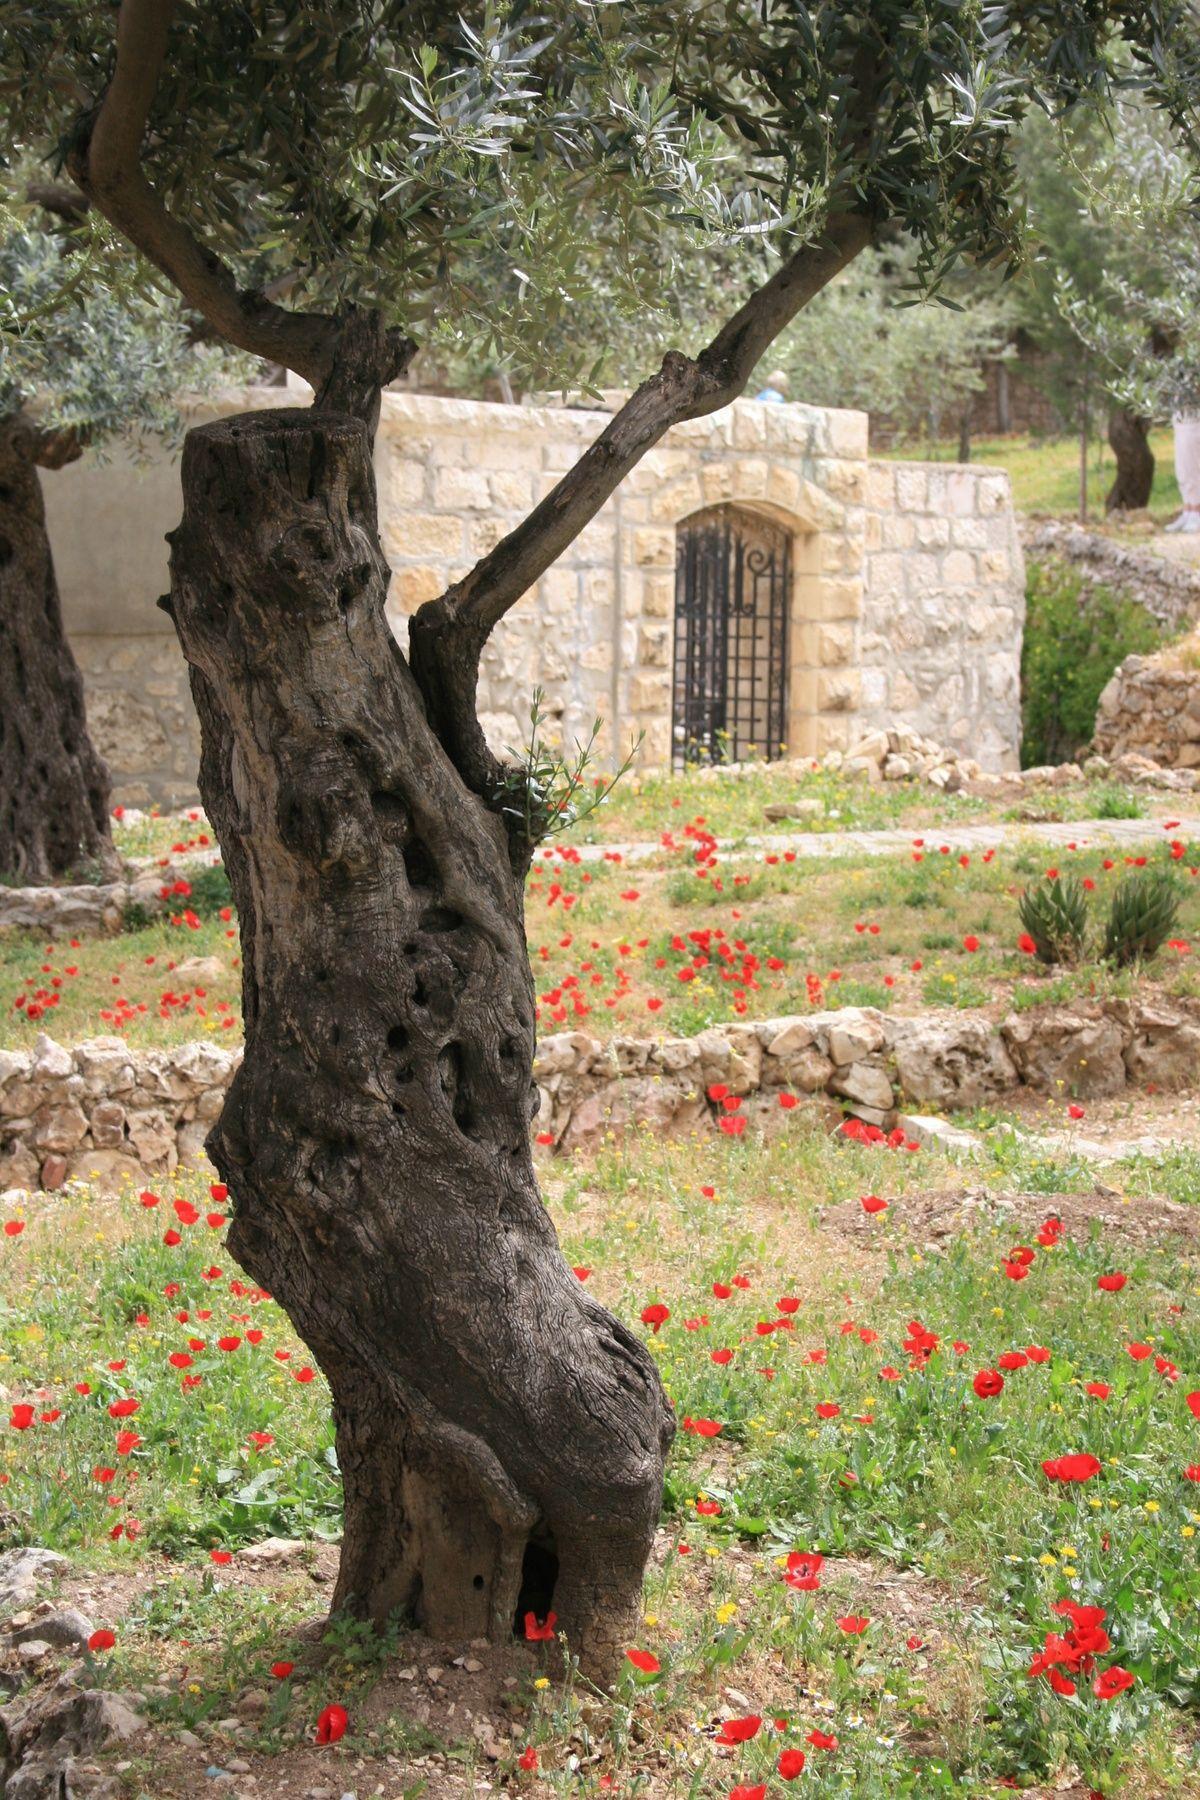 Garden of Gethsemane. Gethsemane is at the foot of the